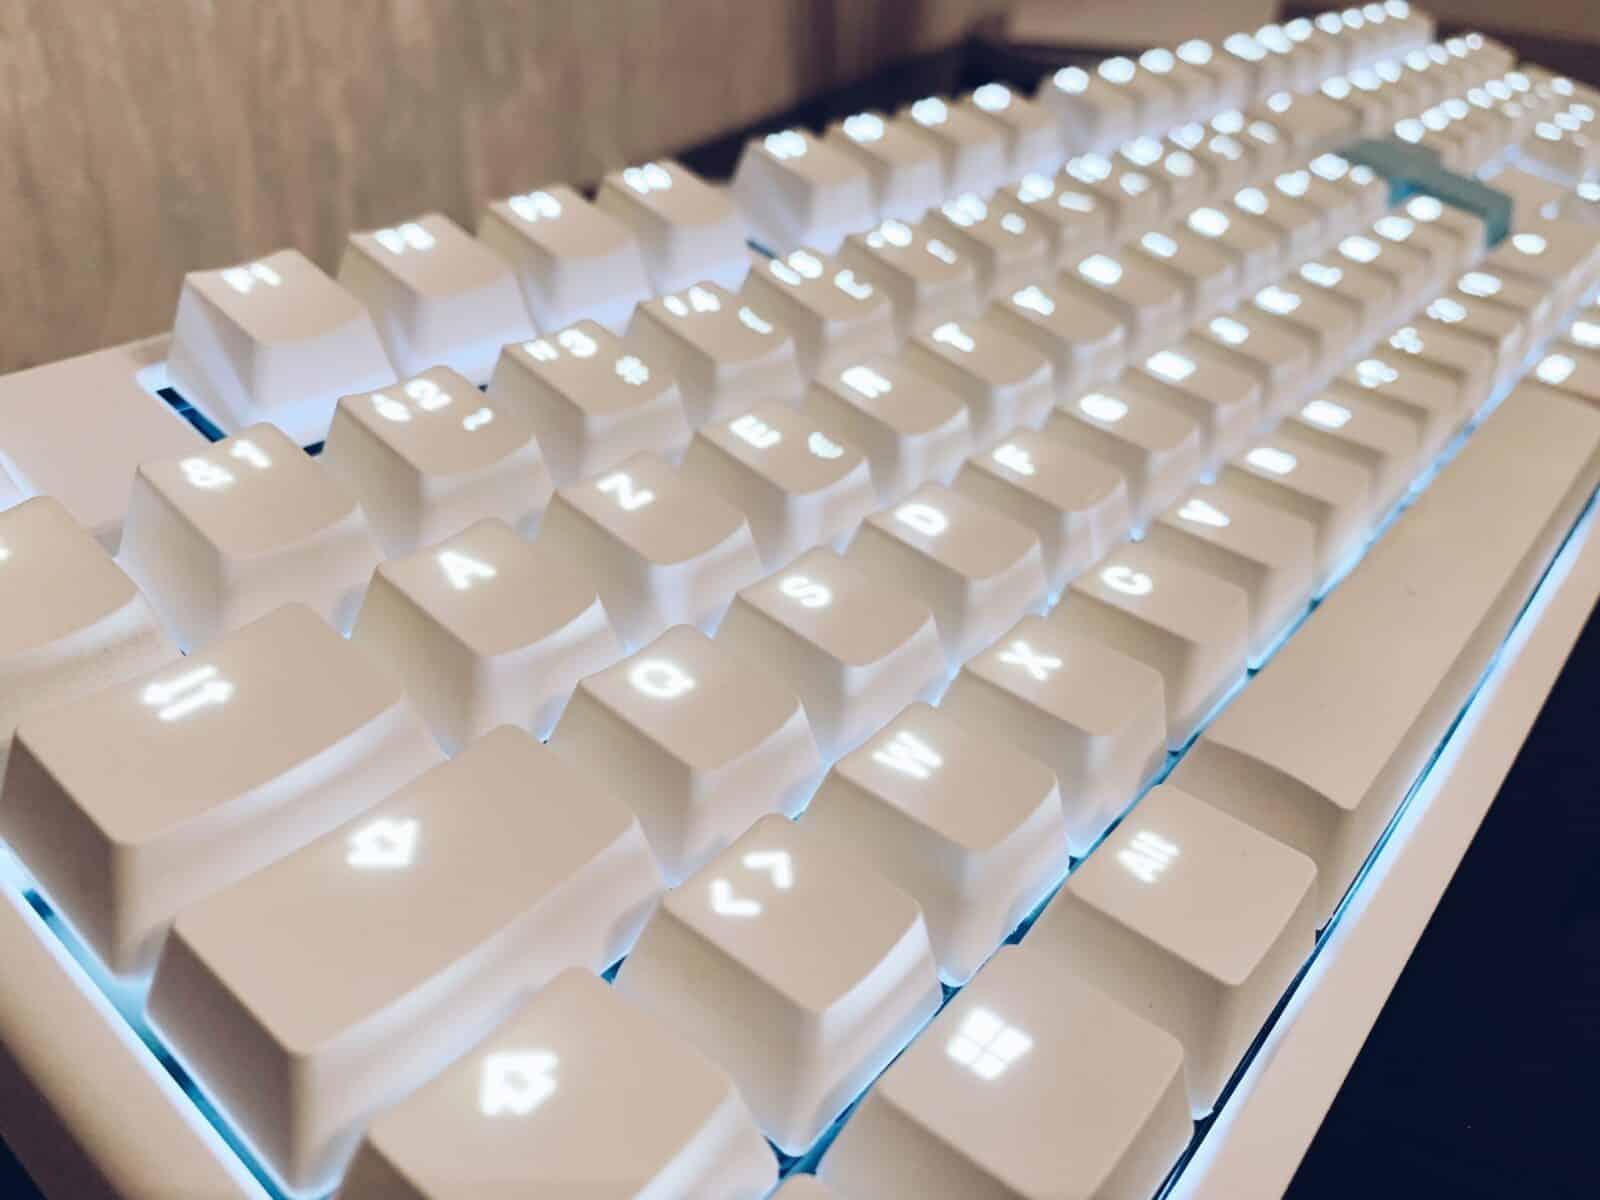 Photographie gauche du clavier